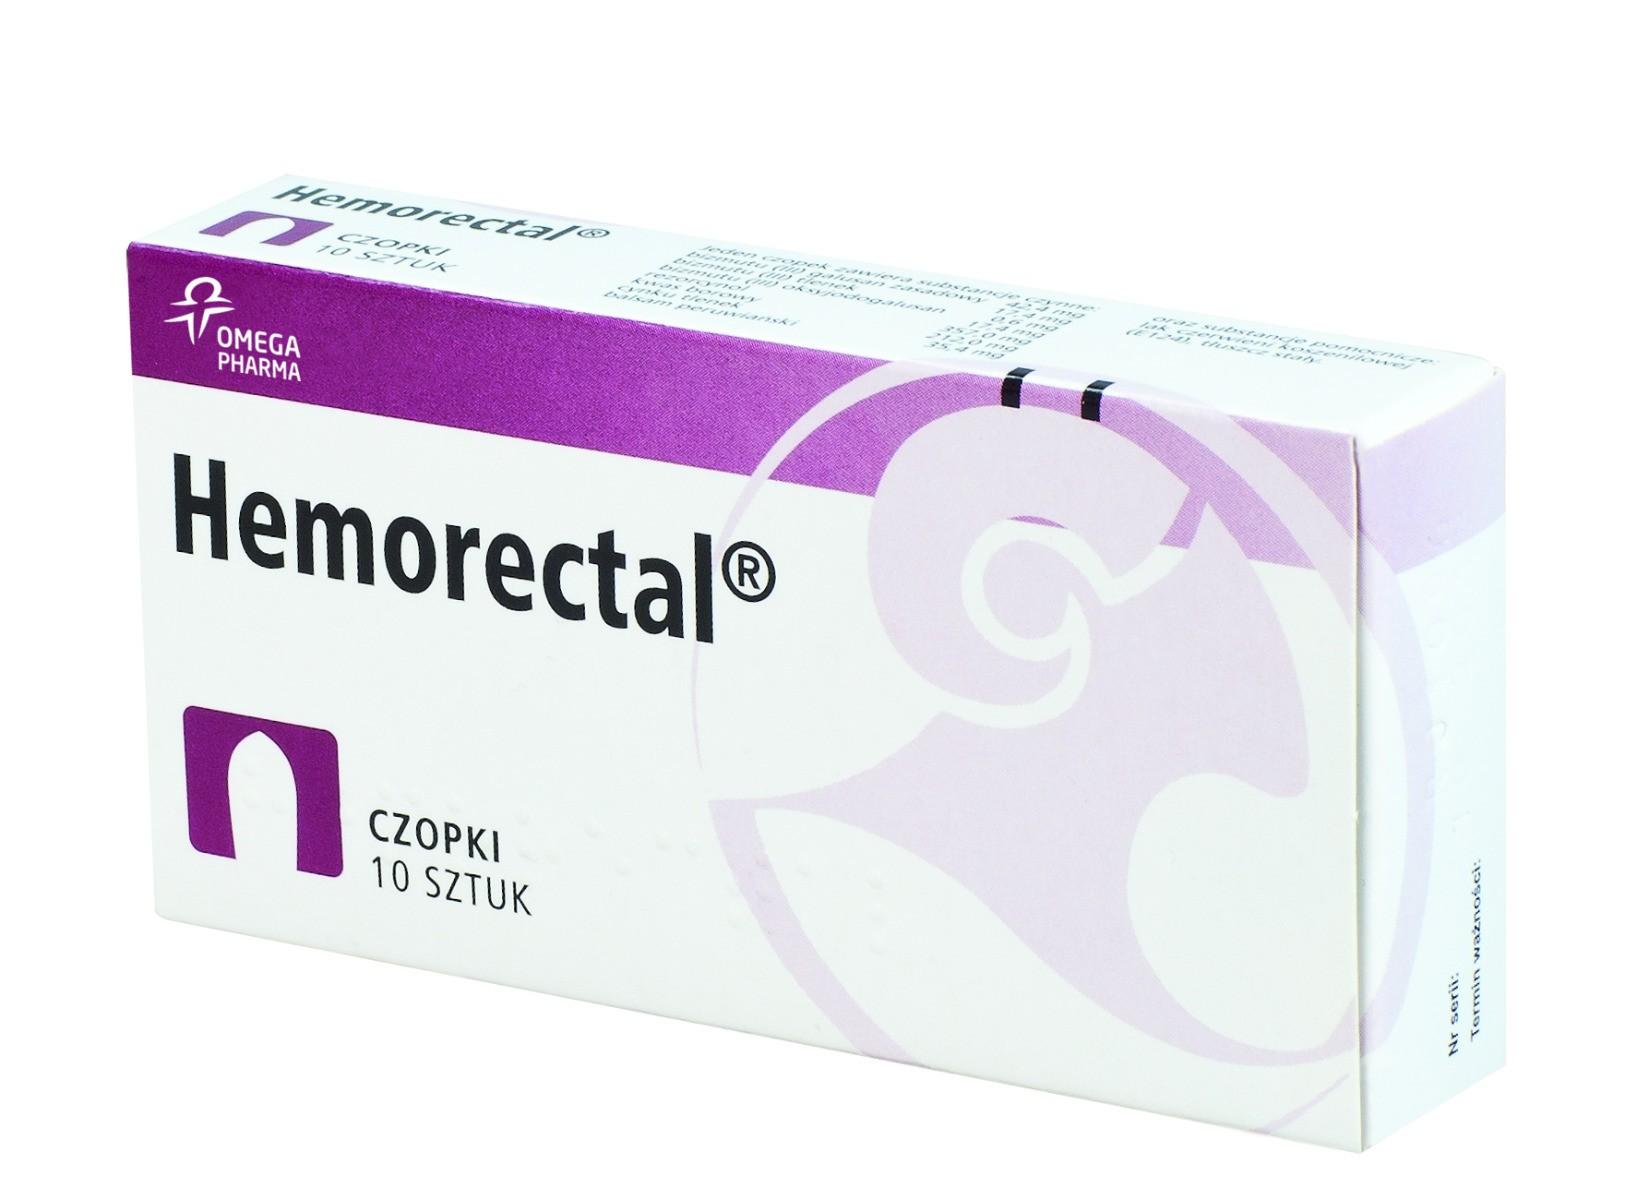 Hemorectal - czopki